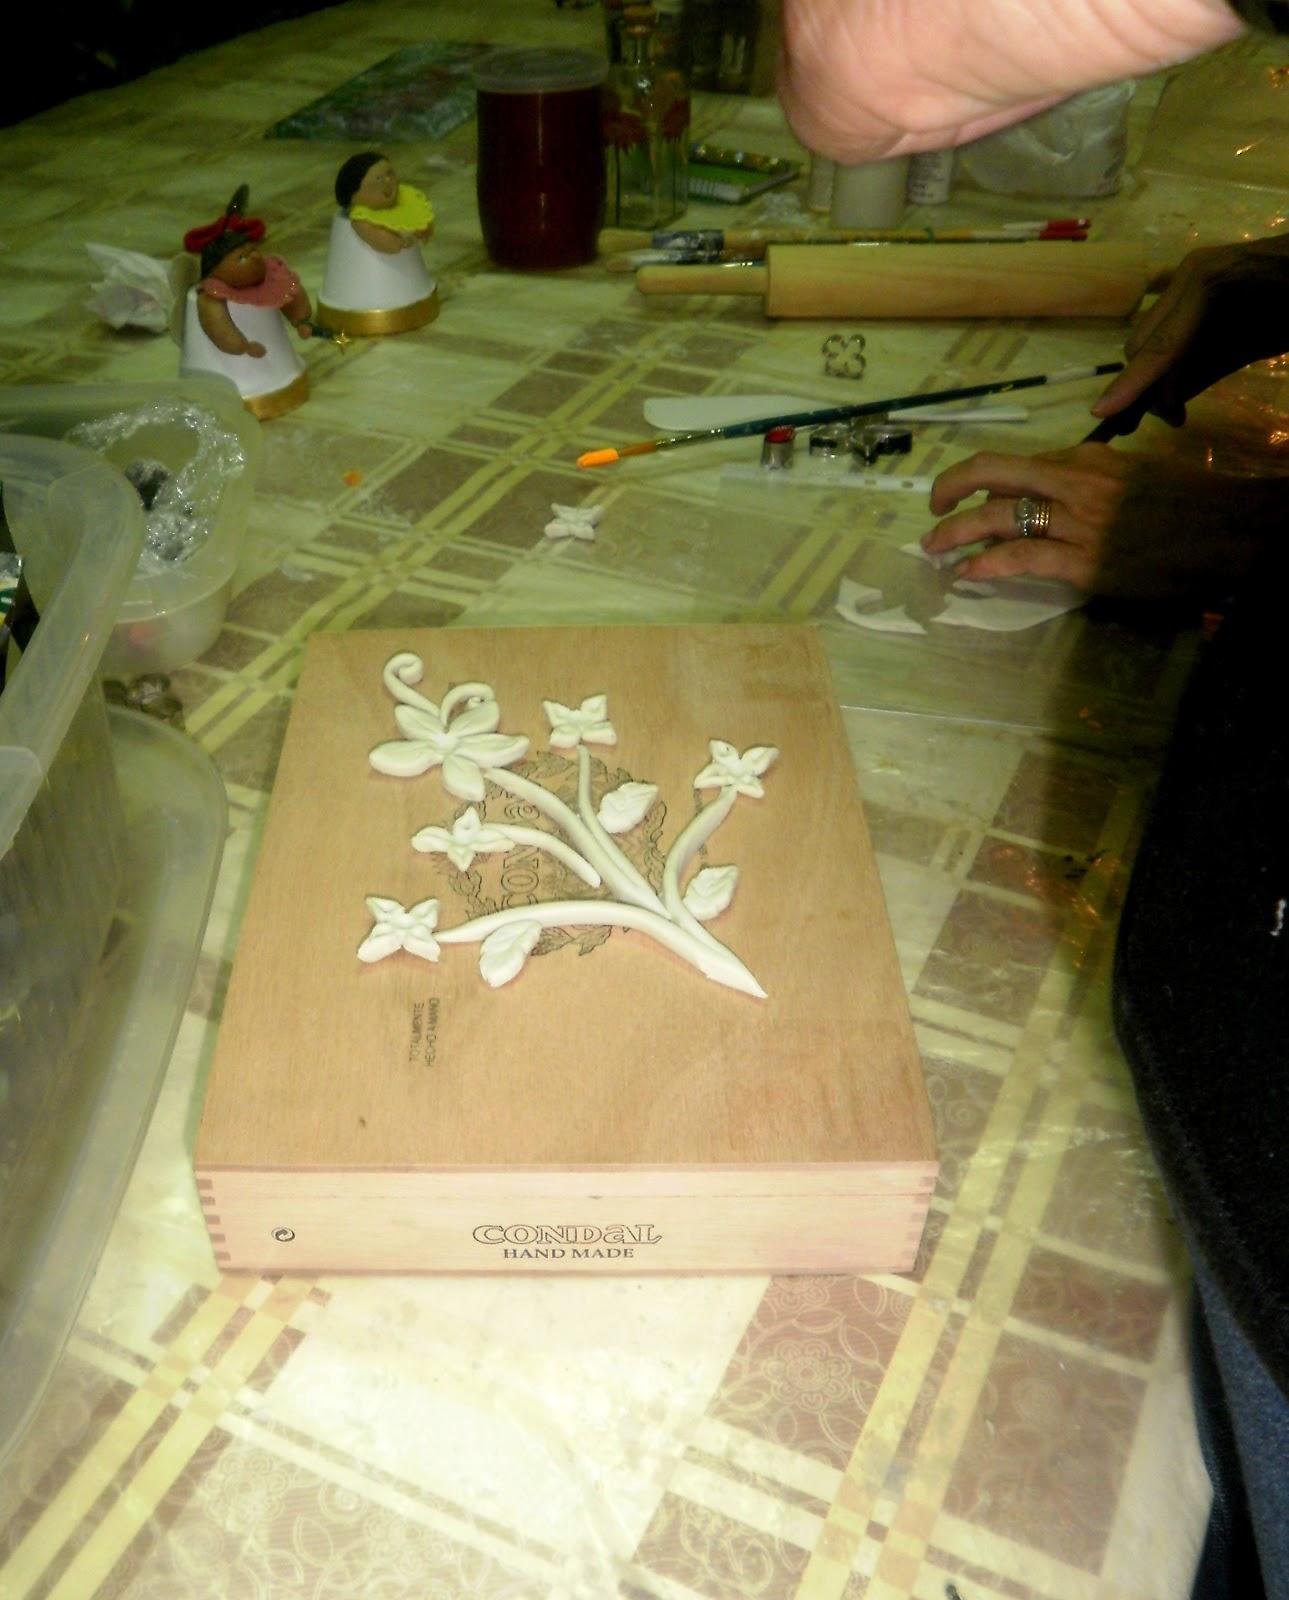 Manualidades y algo m s pasta de modelar - Pasta para modelar manualidades ...